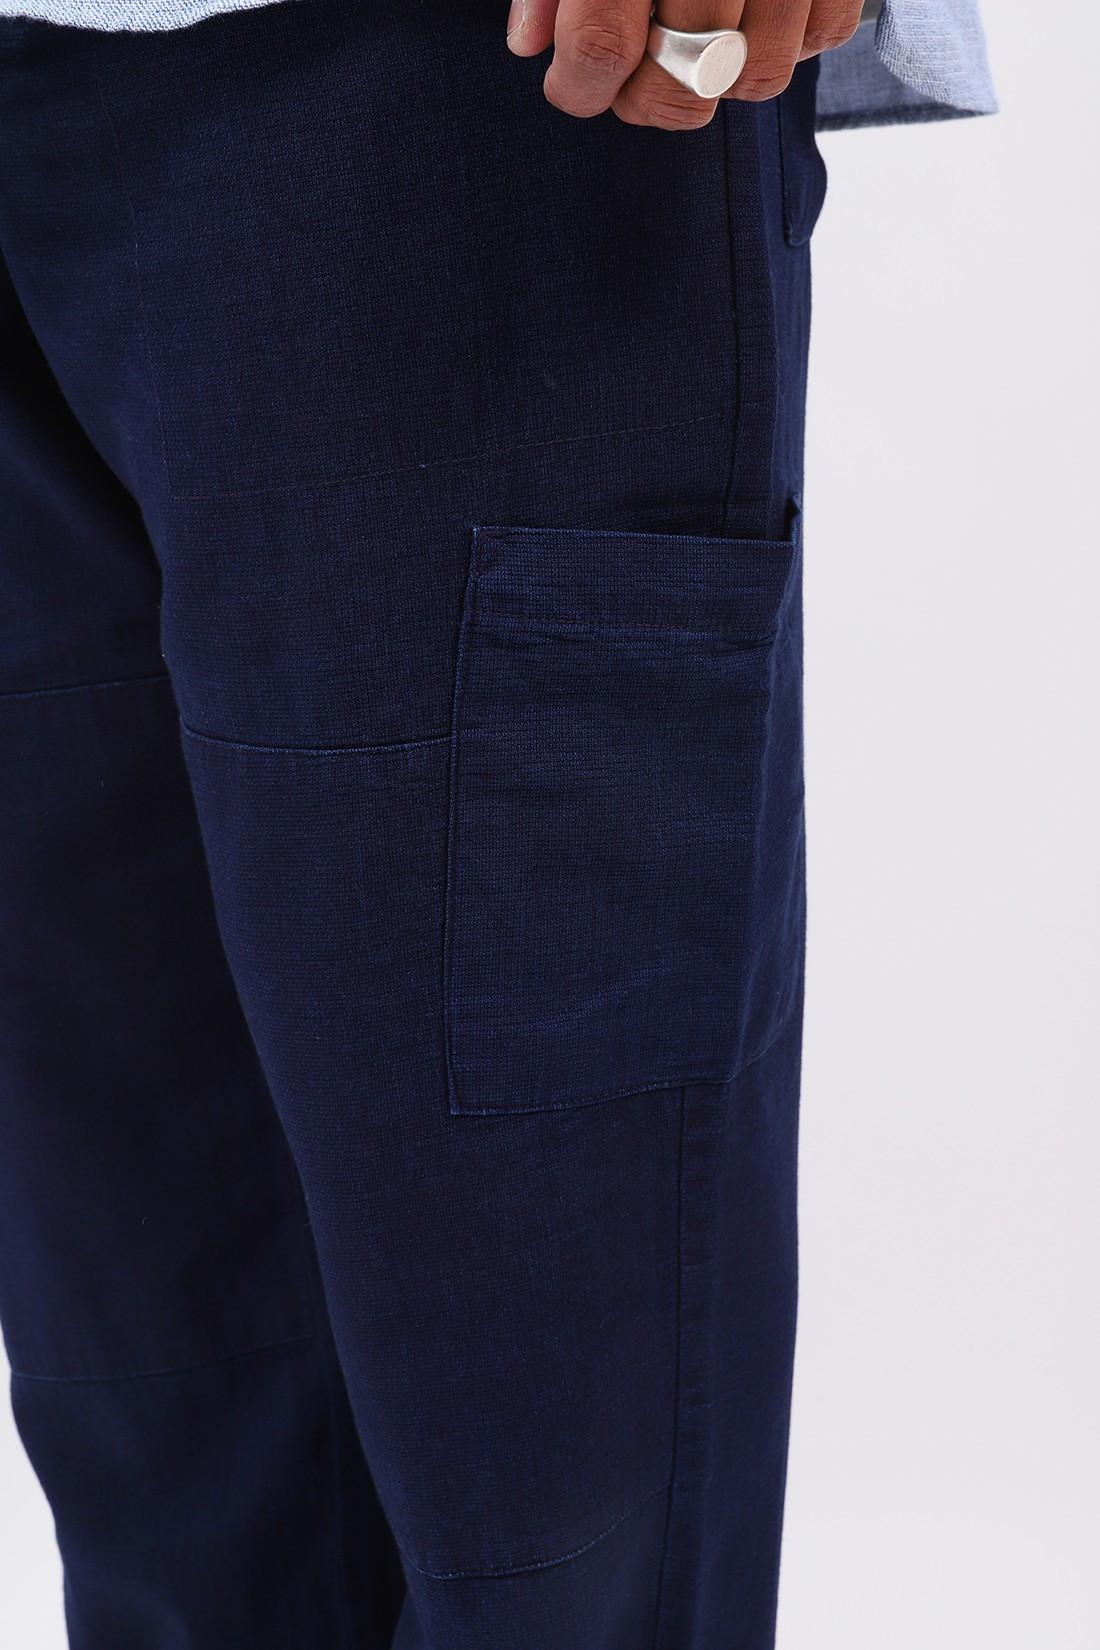 OLIVER SPENCER / Judo pant cotton Navy